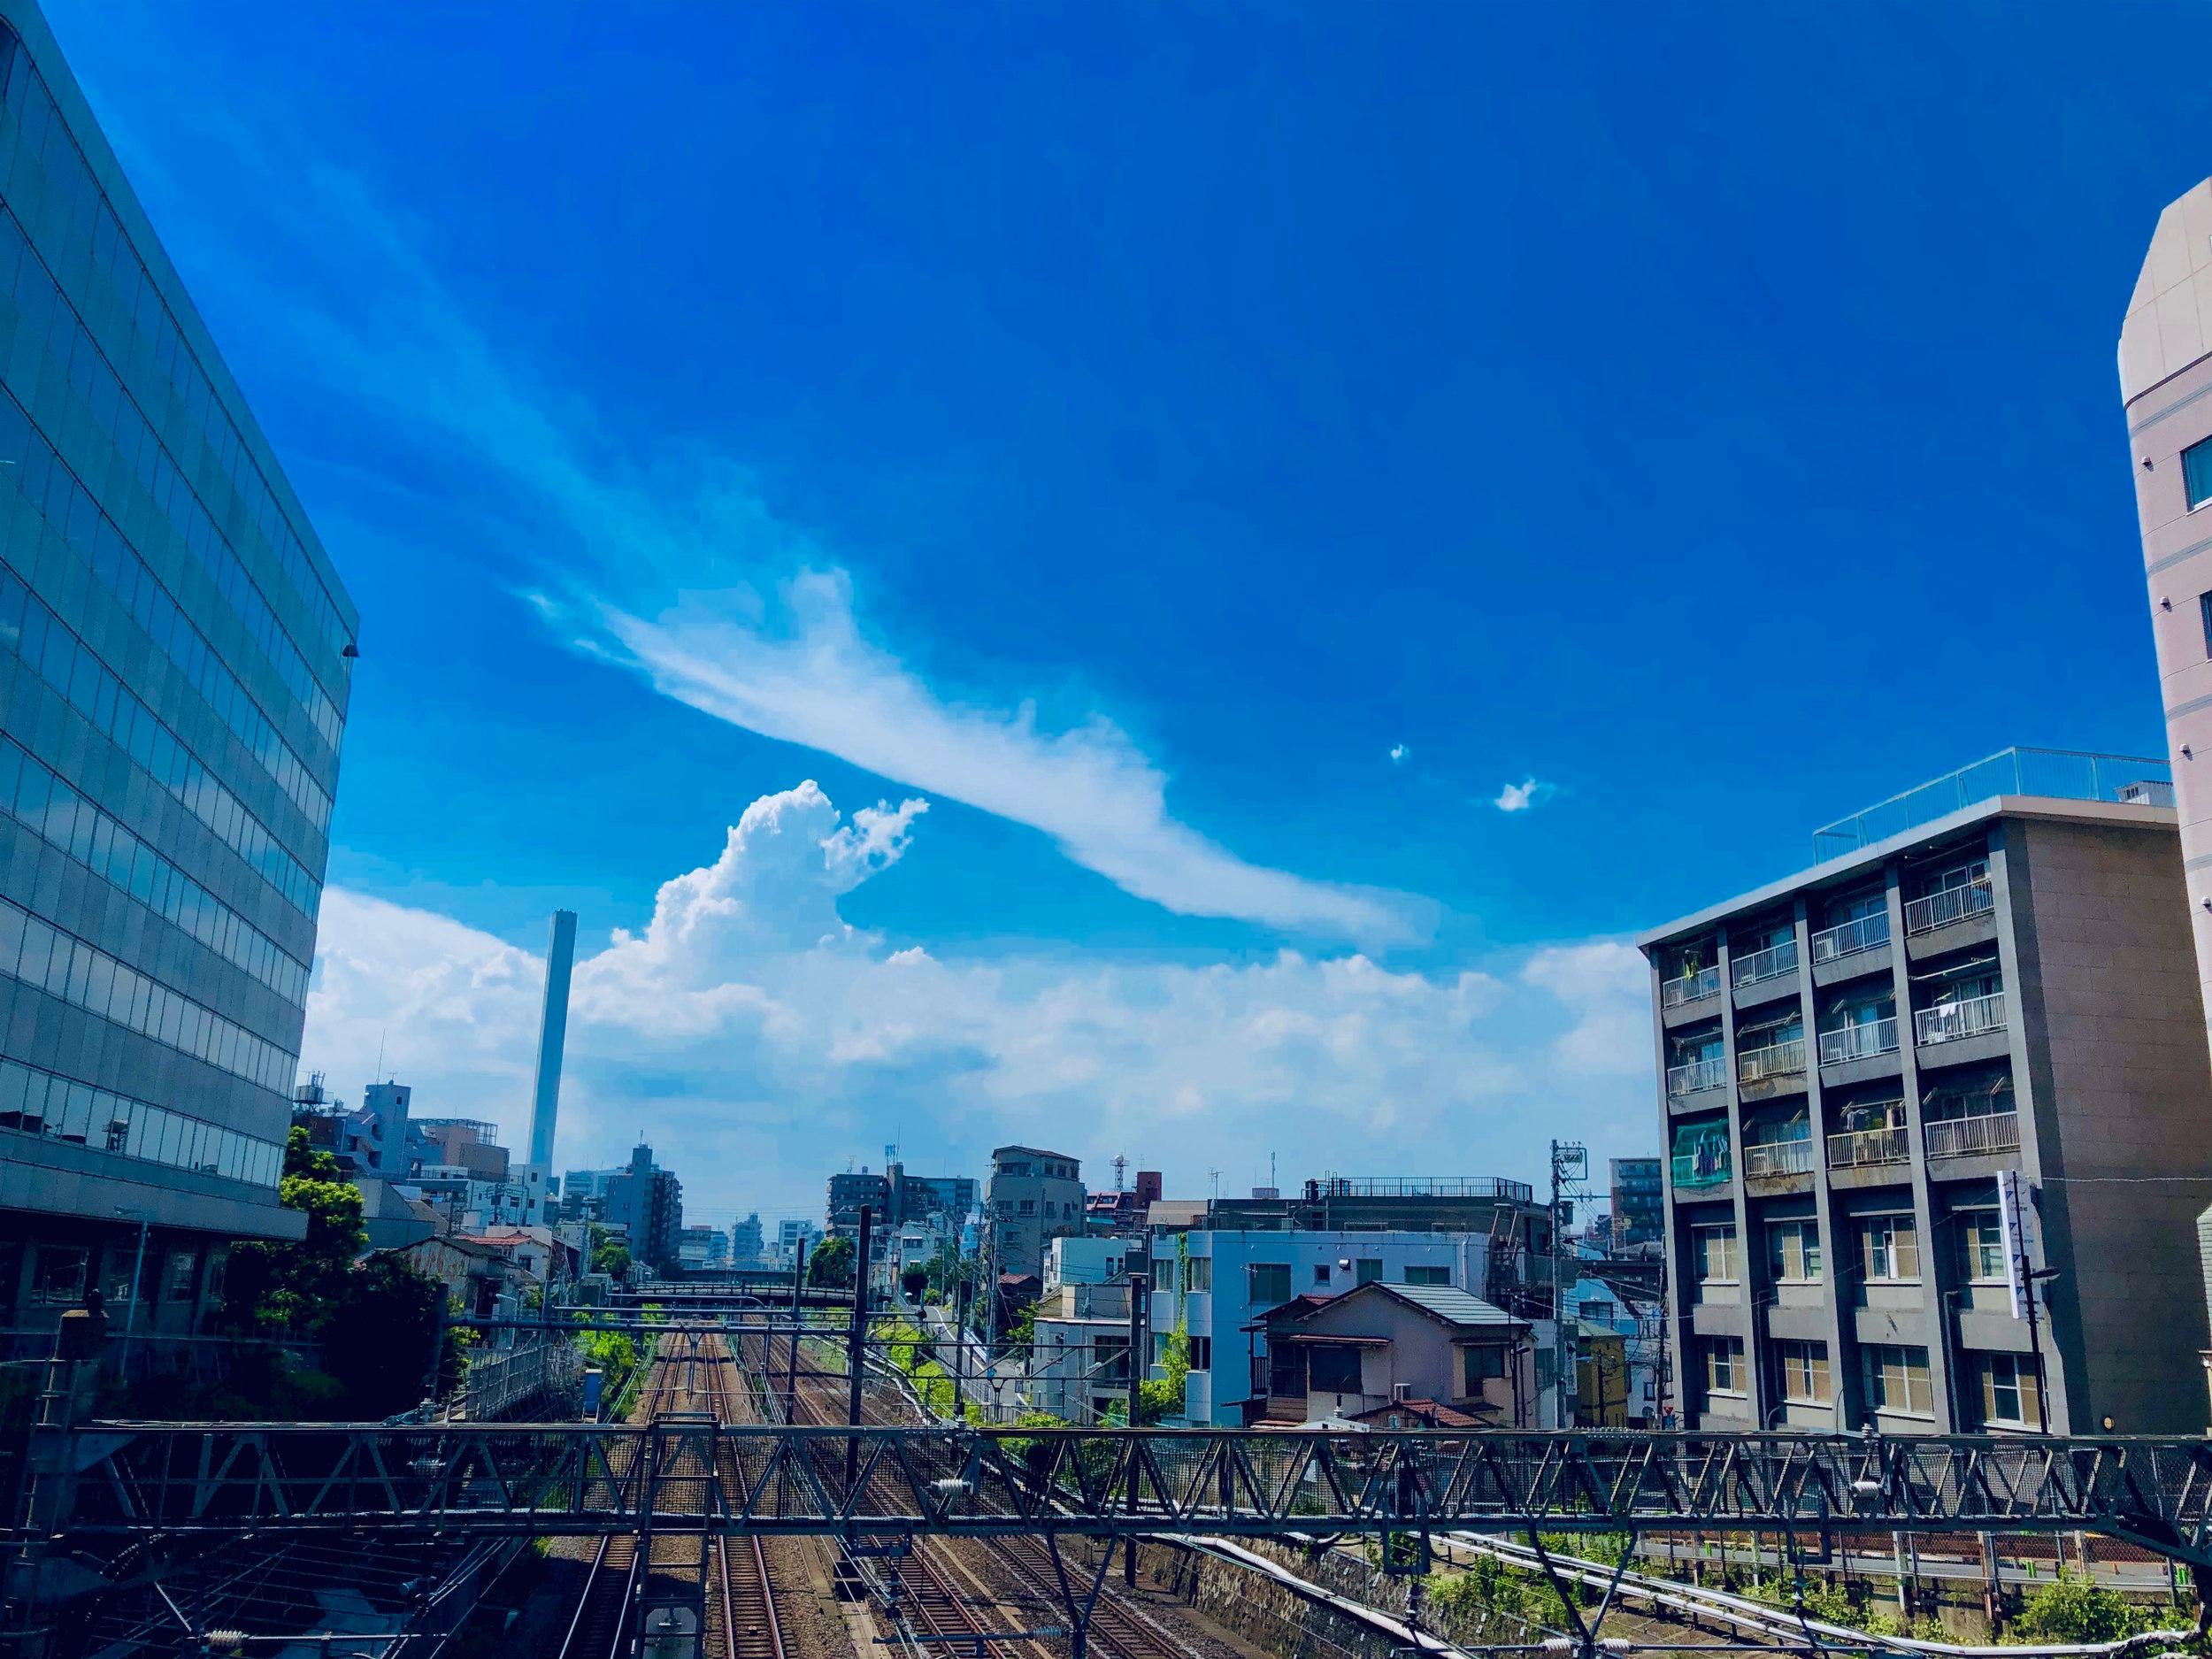 大塚駅近郊 by Yohei